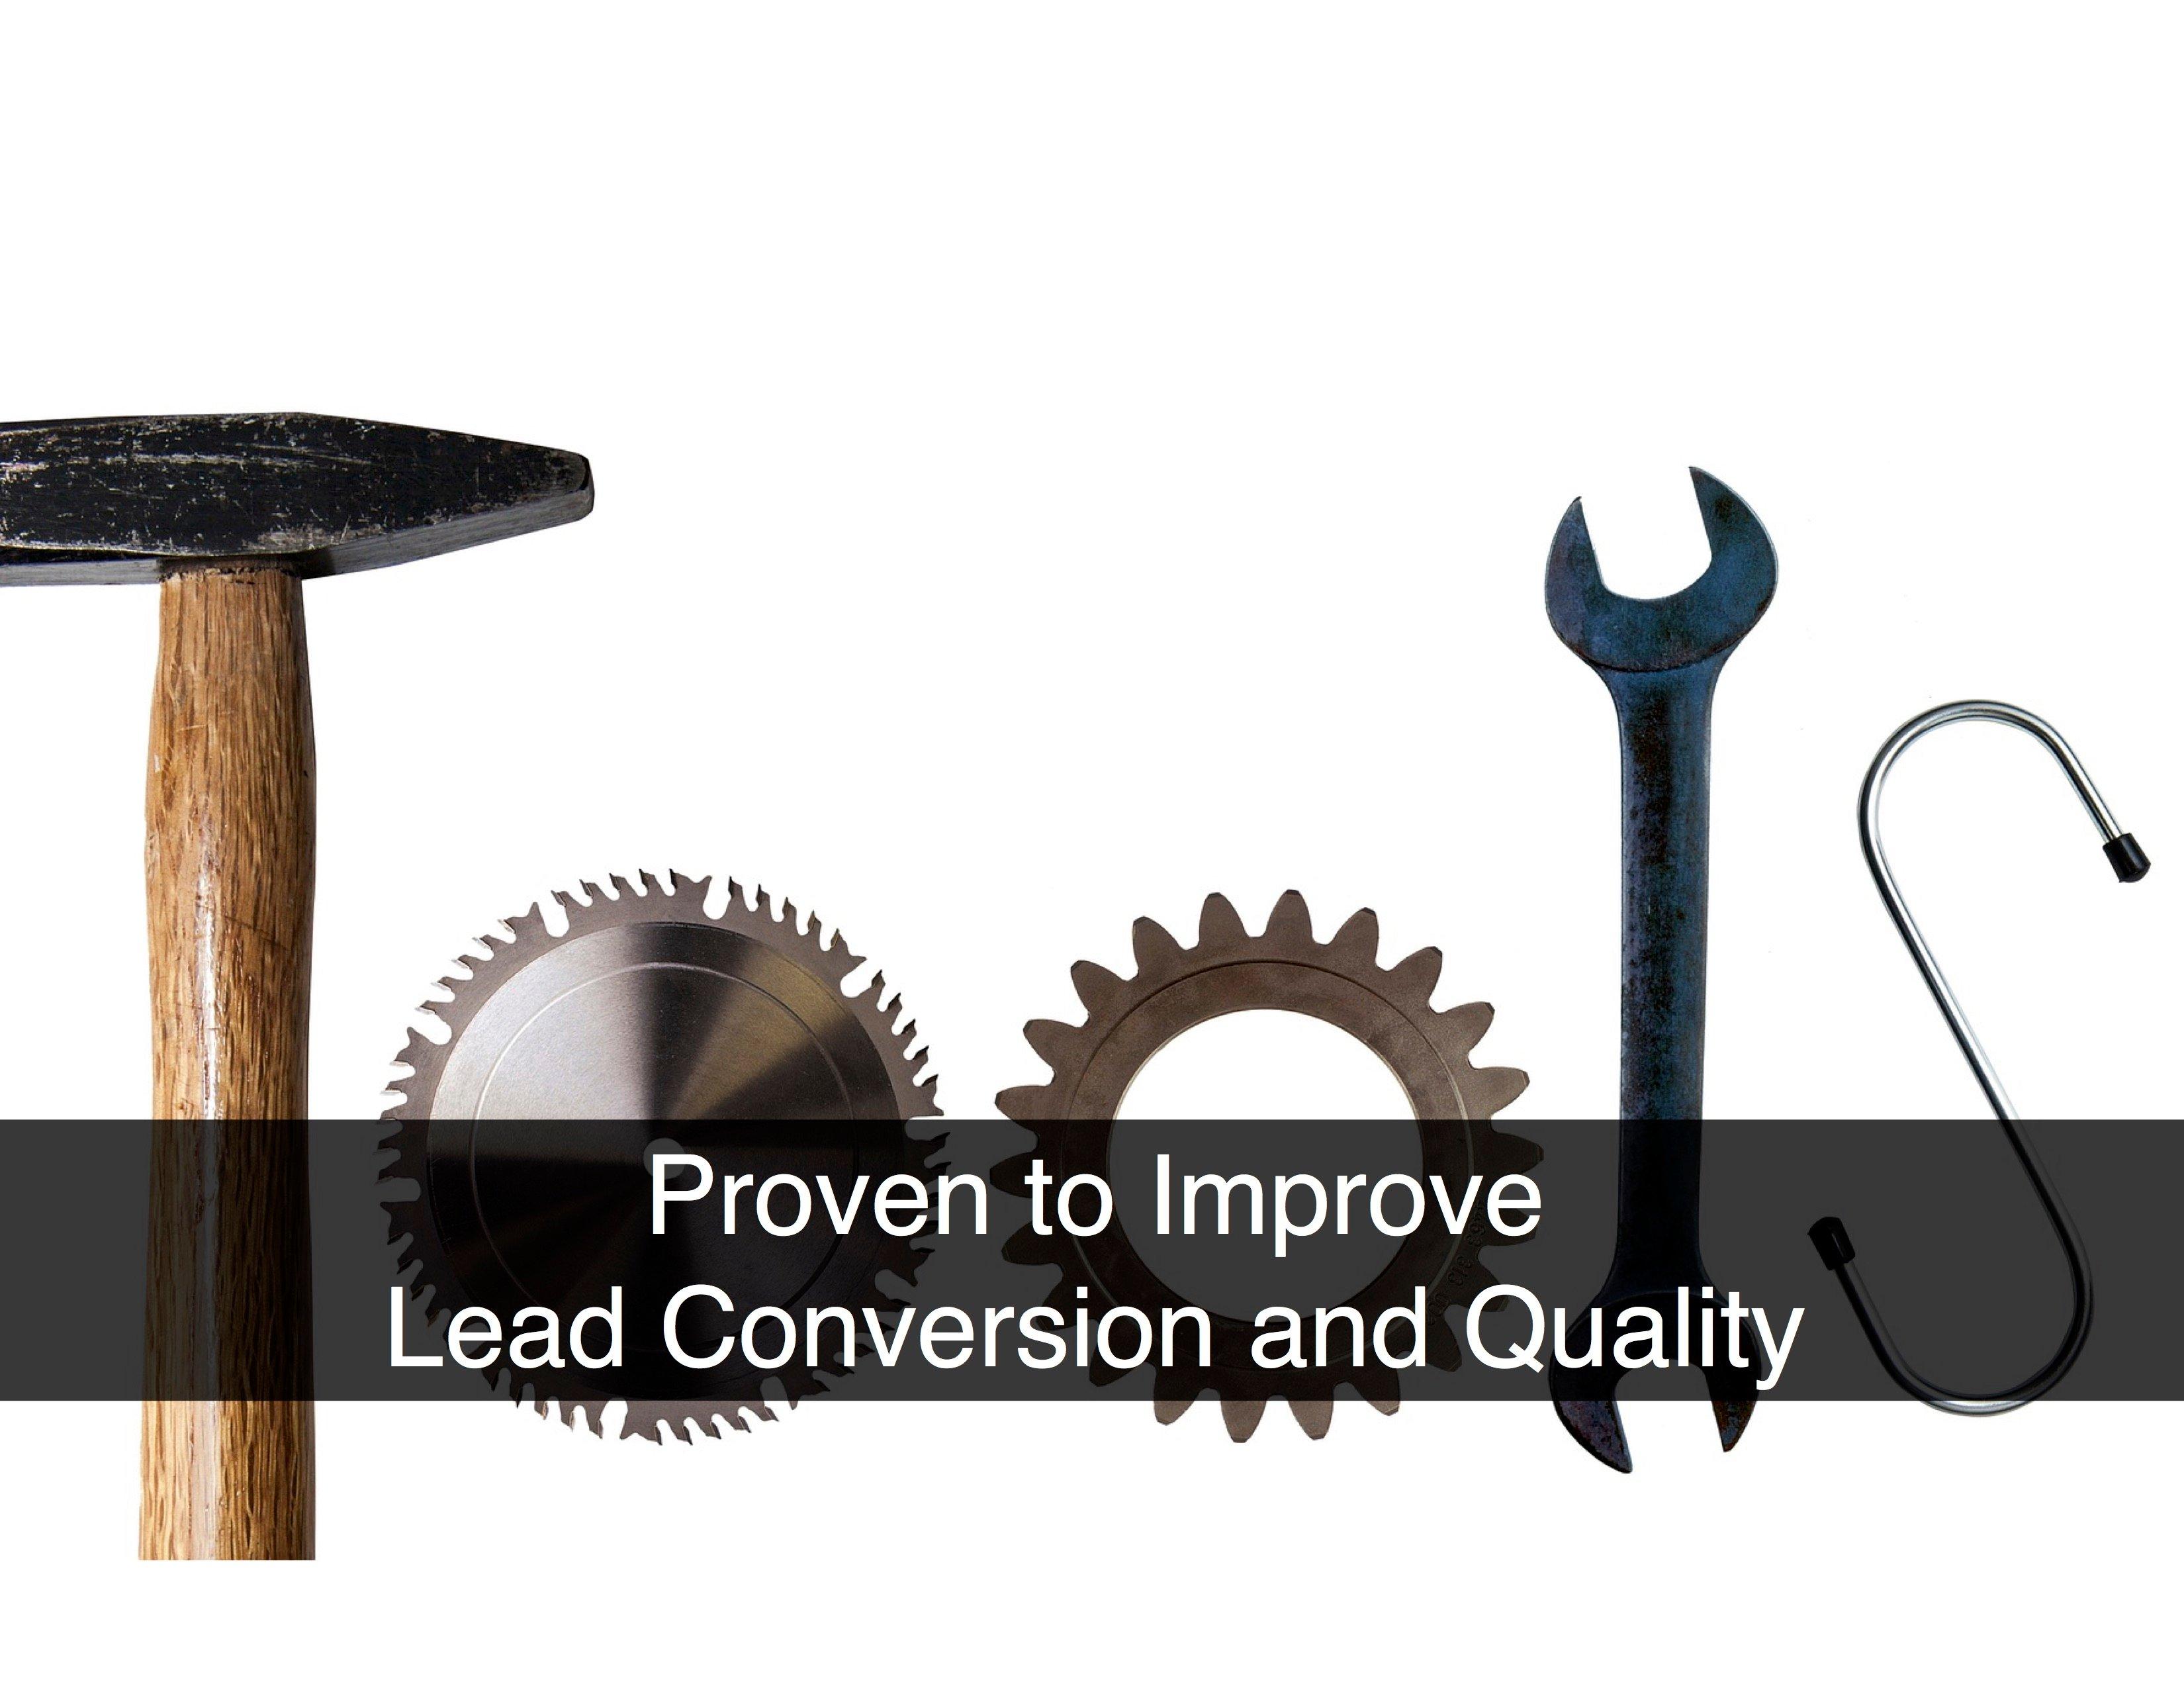 Proven Tools to Improve